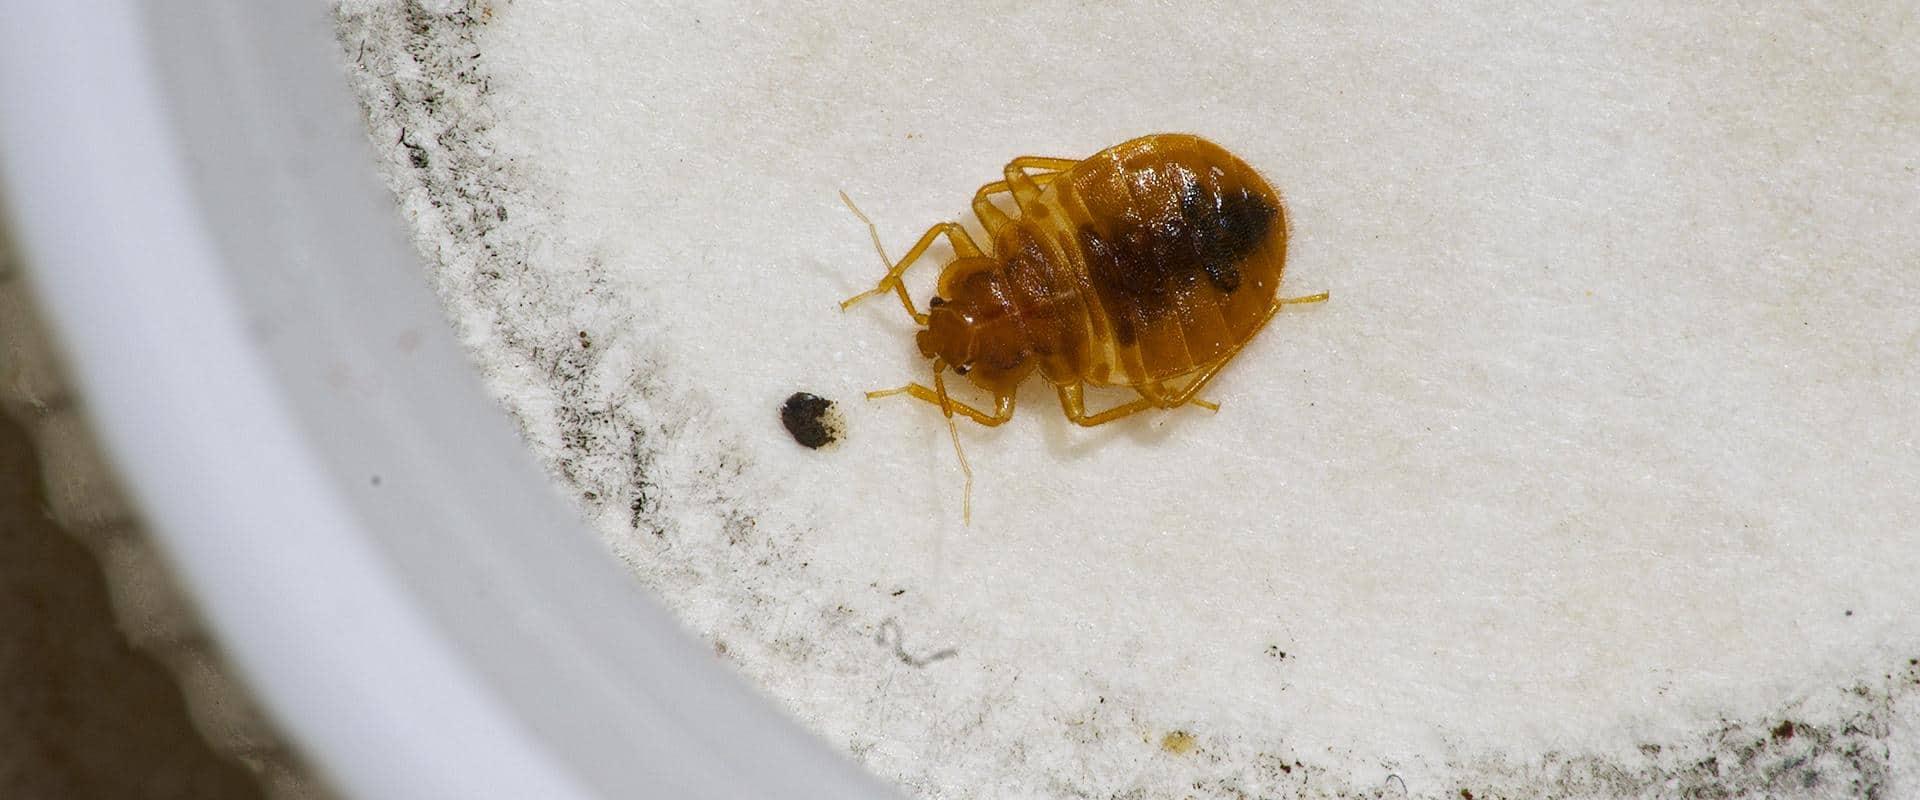 bed bug in ellensburg wa home